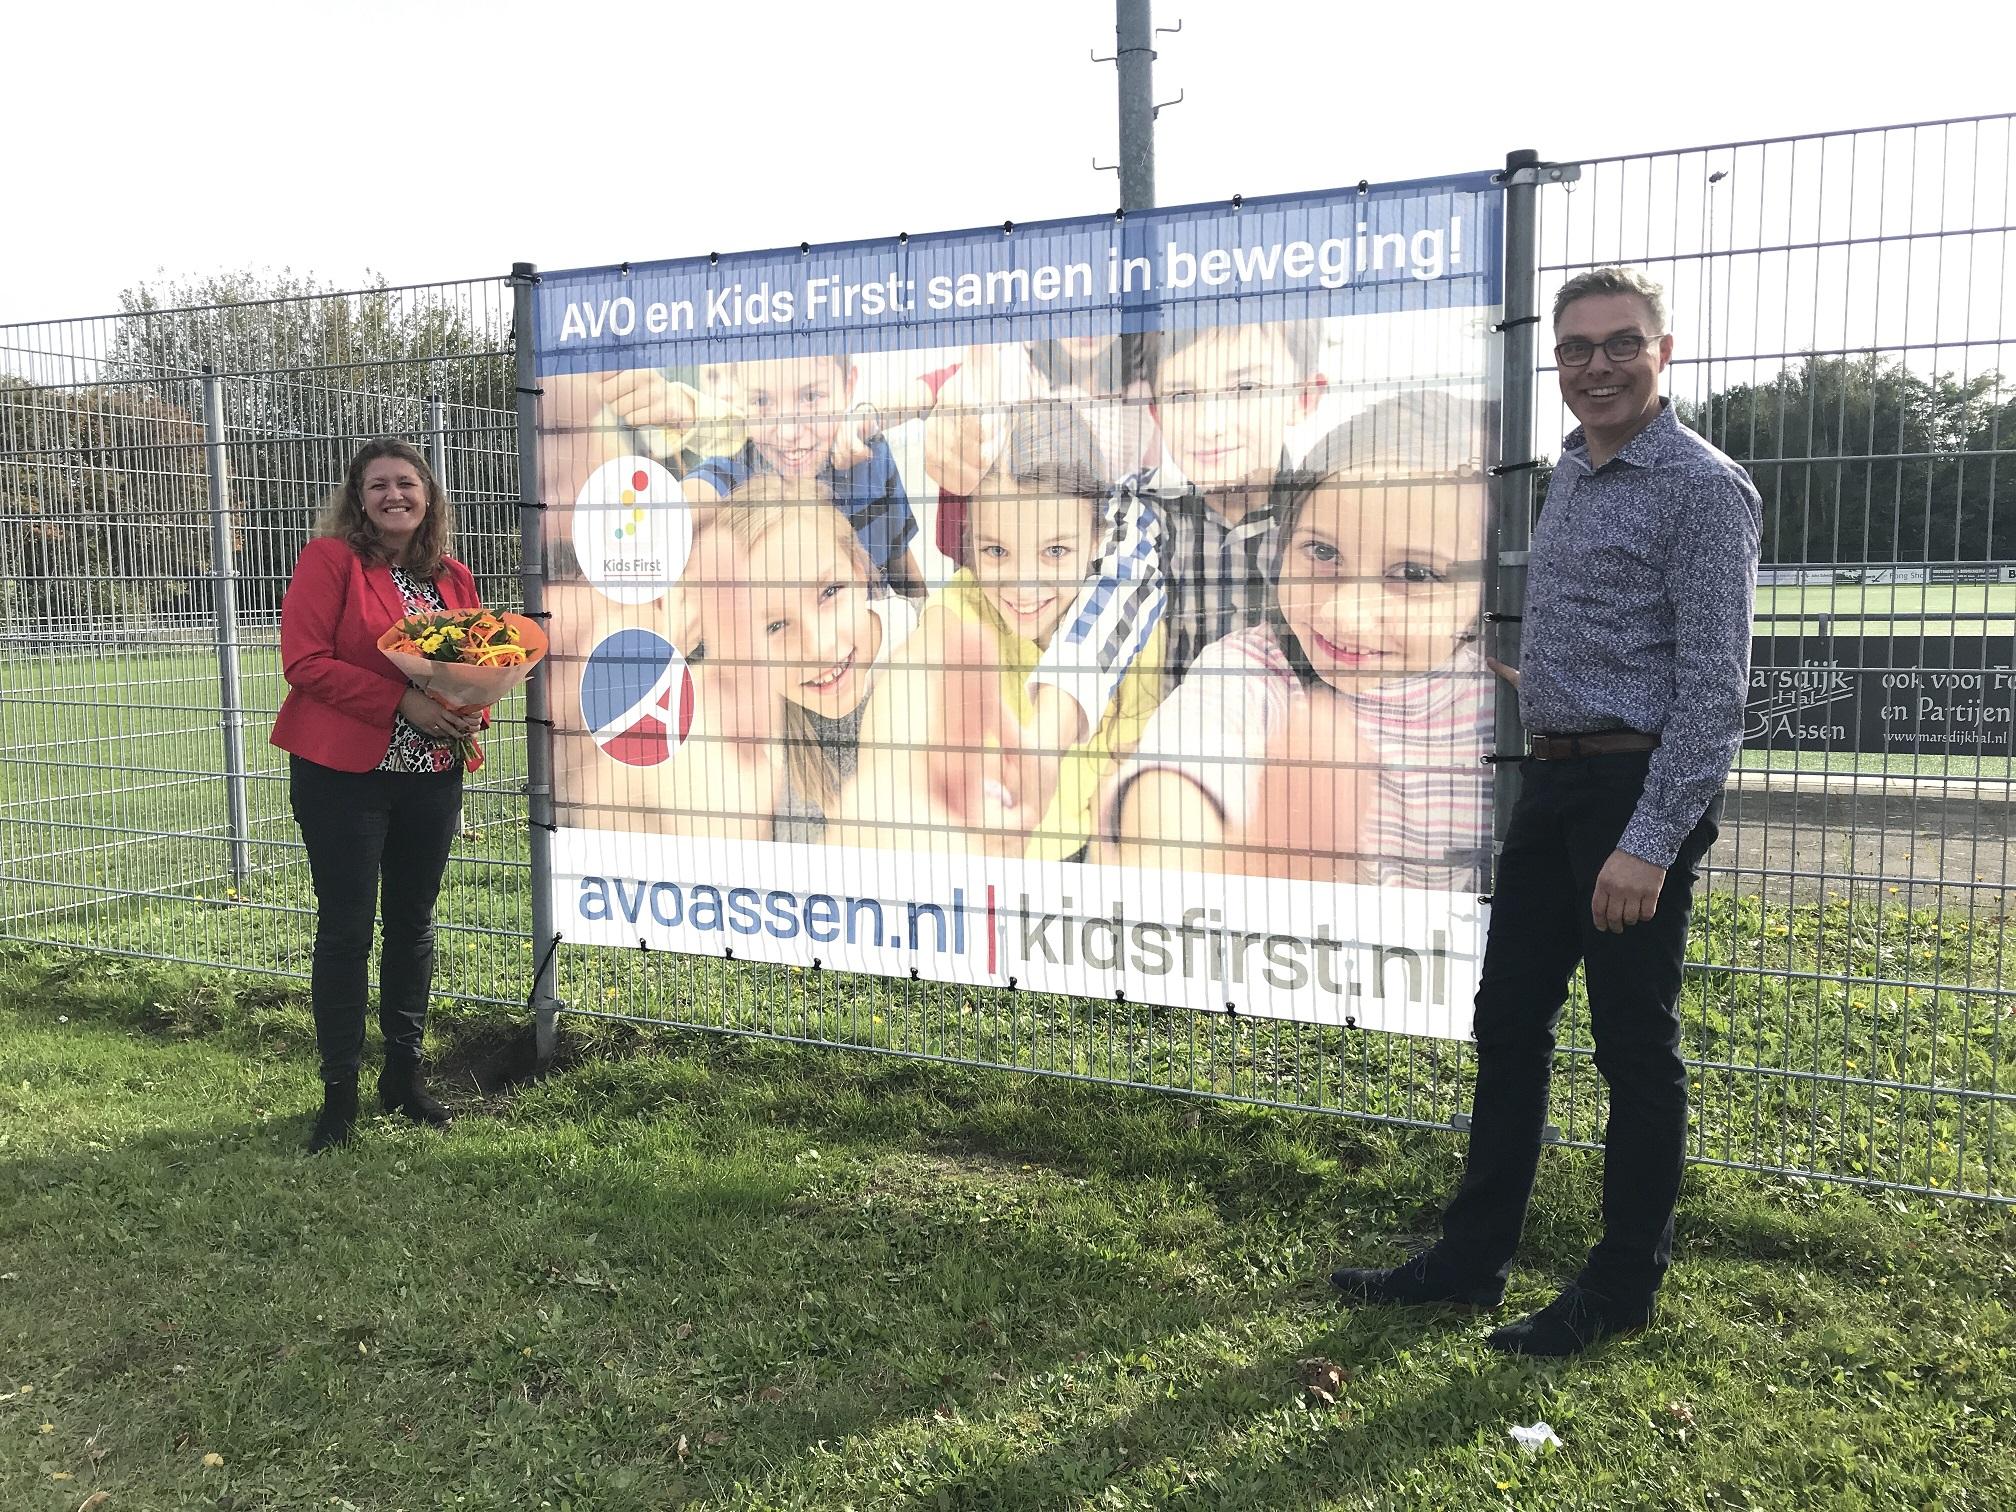 AVO Assen en Kids First samen in beweging - Kids First COP groep kinderopvang Drenthe